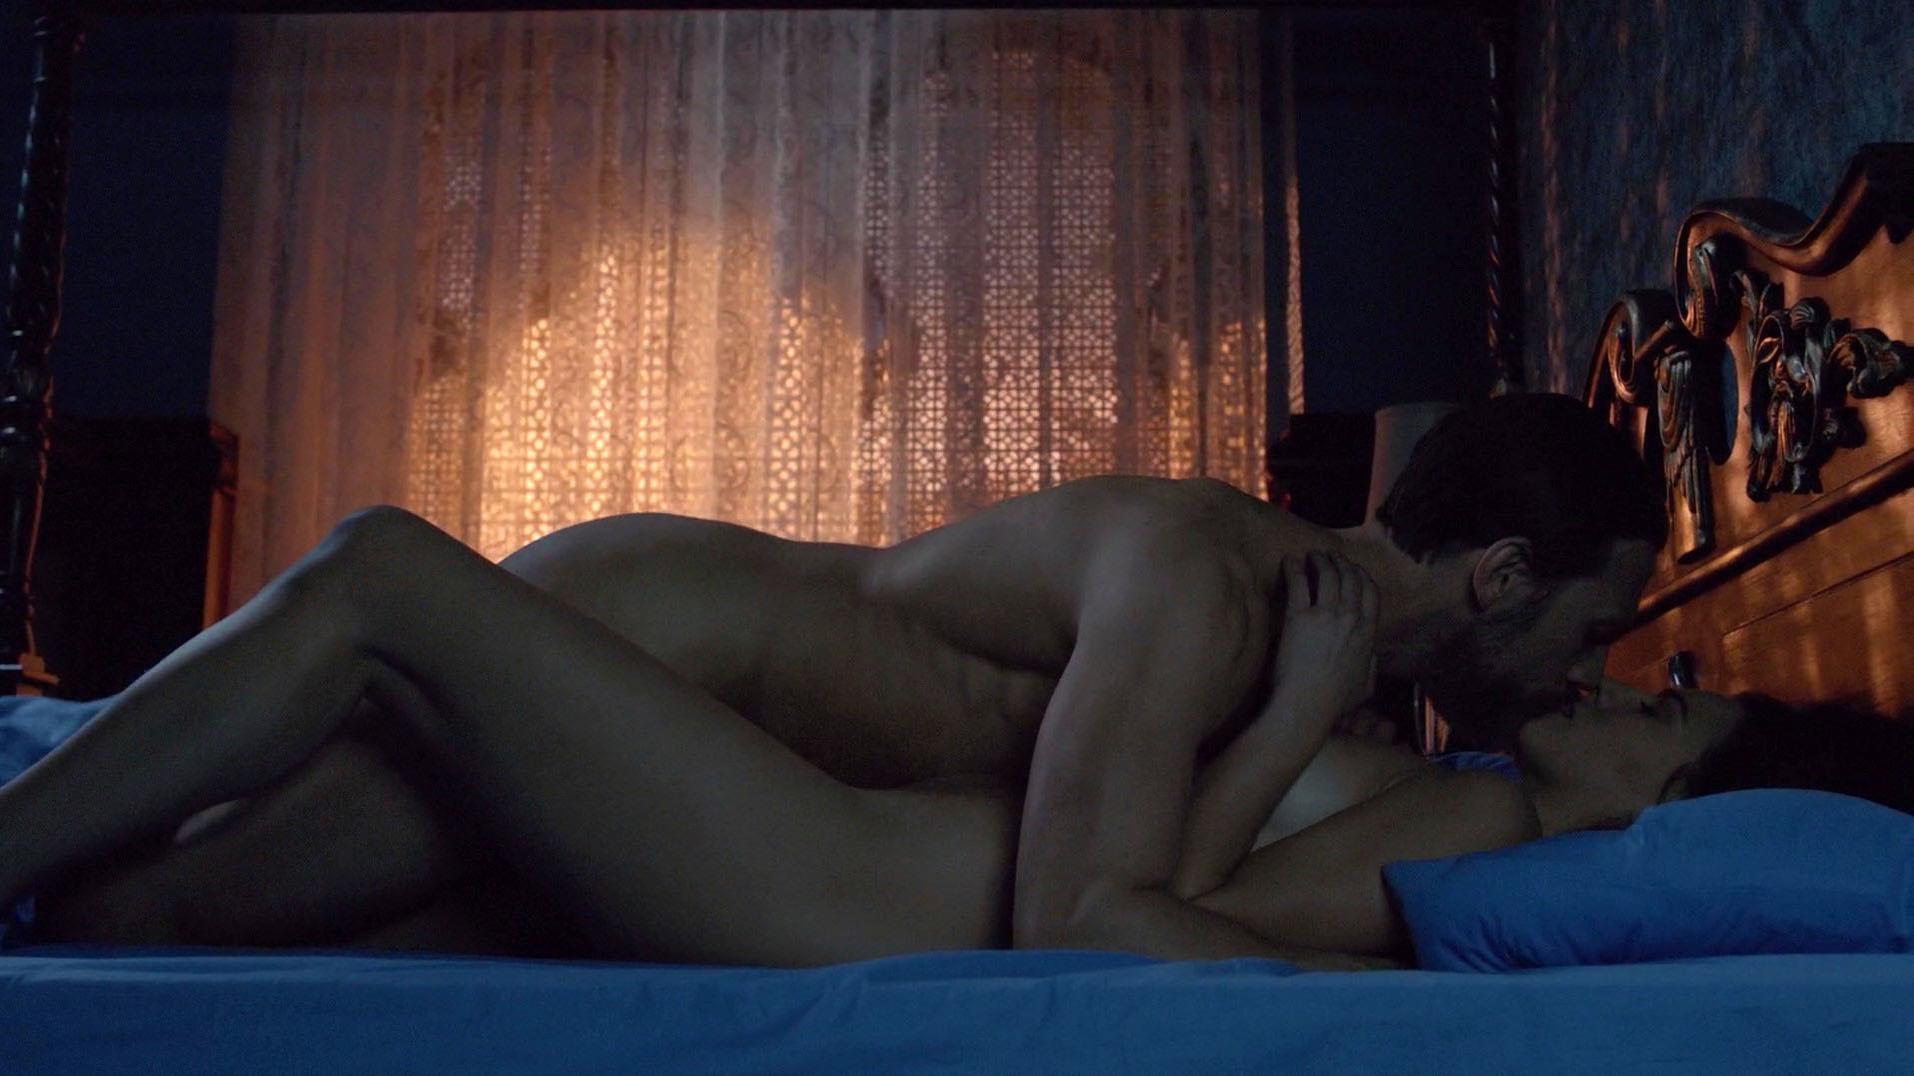 Nude Video Celebs Actress Melia Kreiling